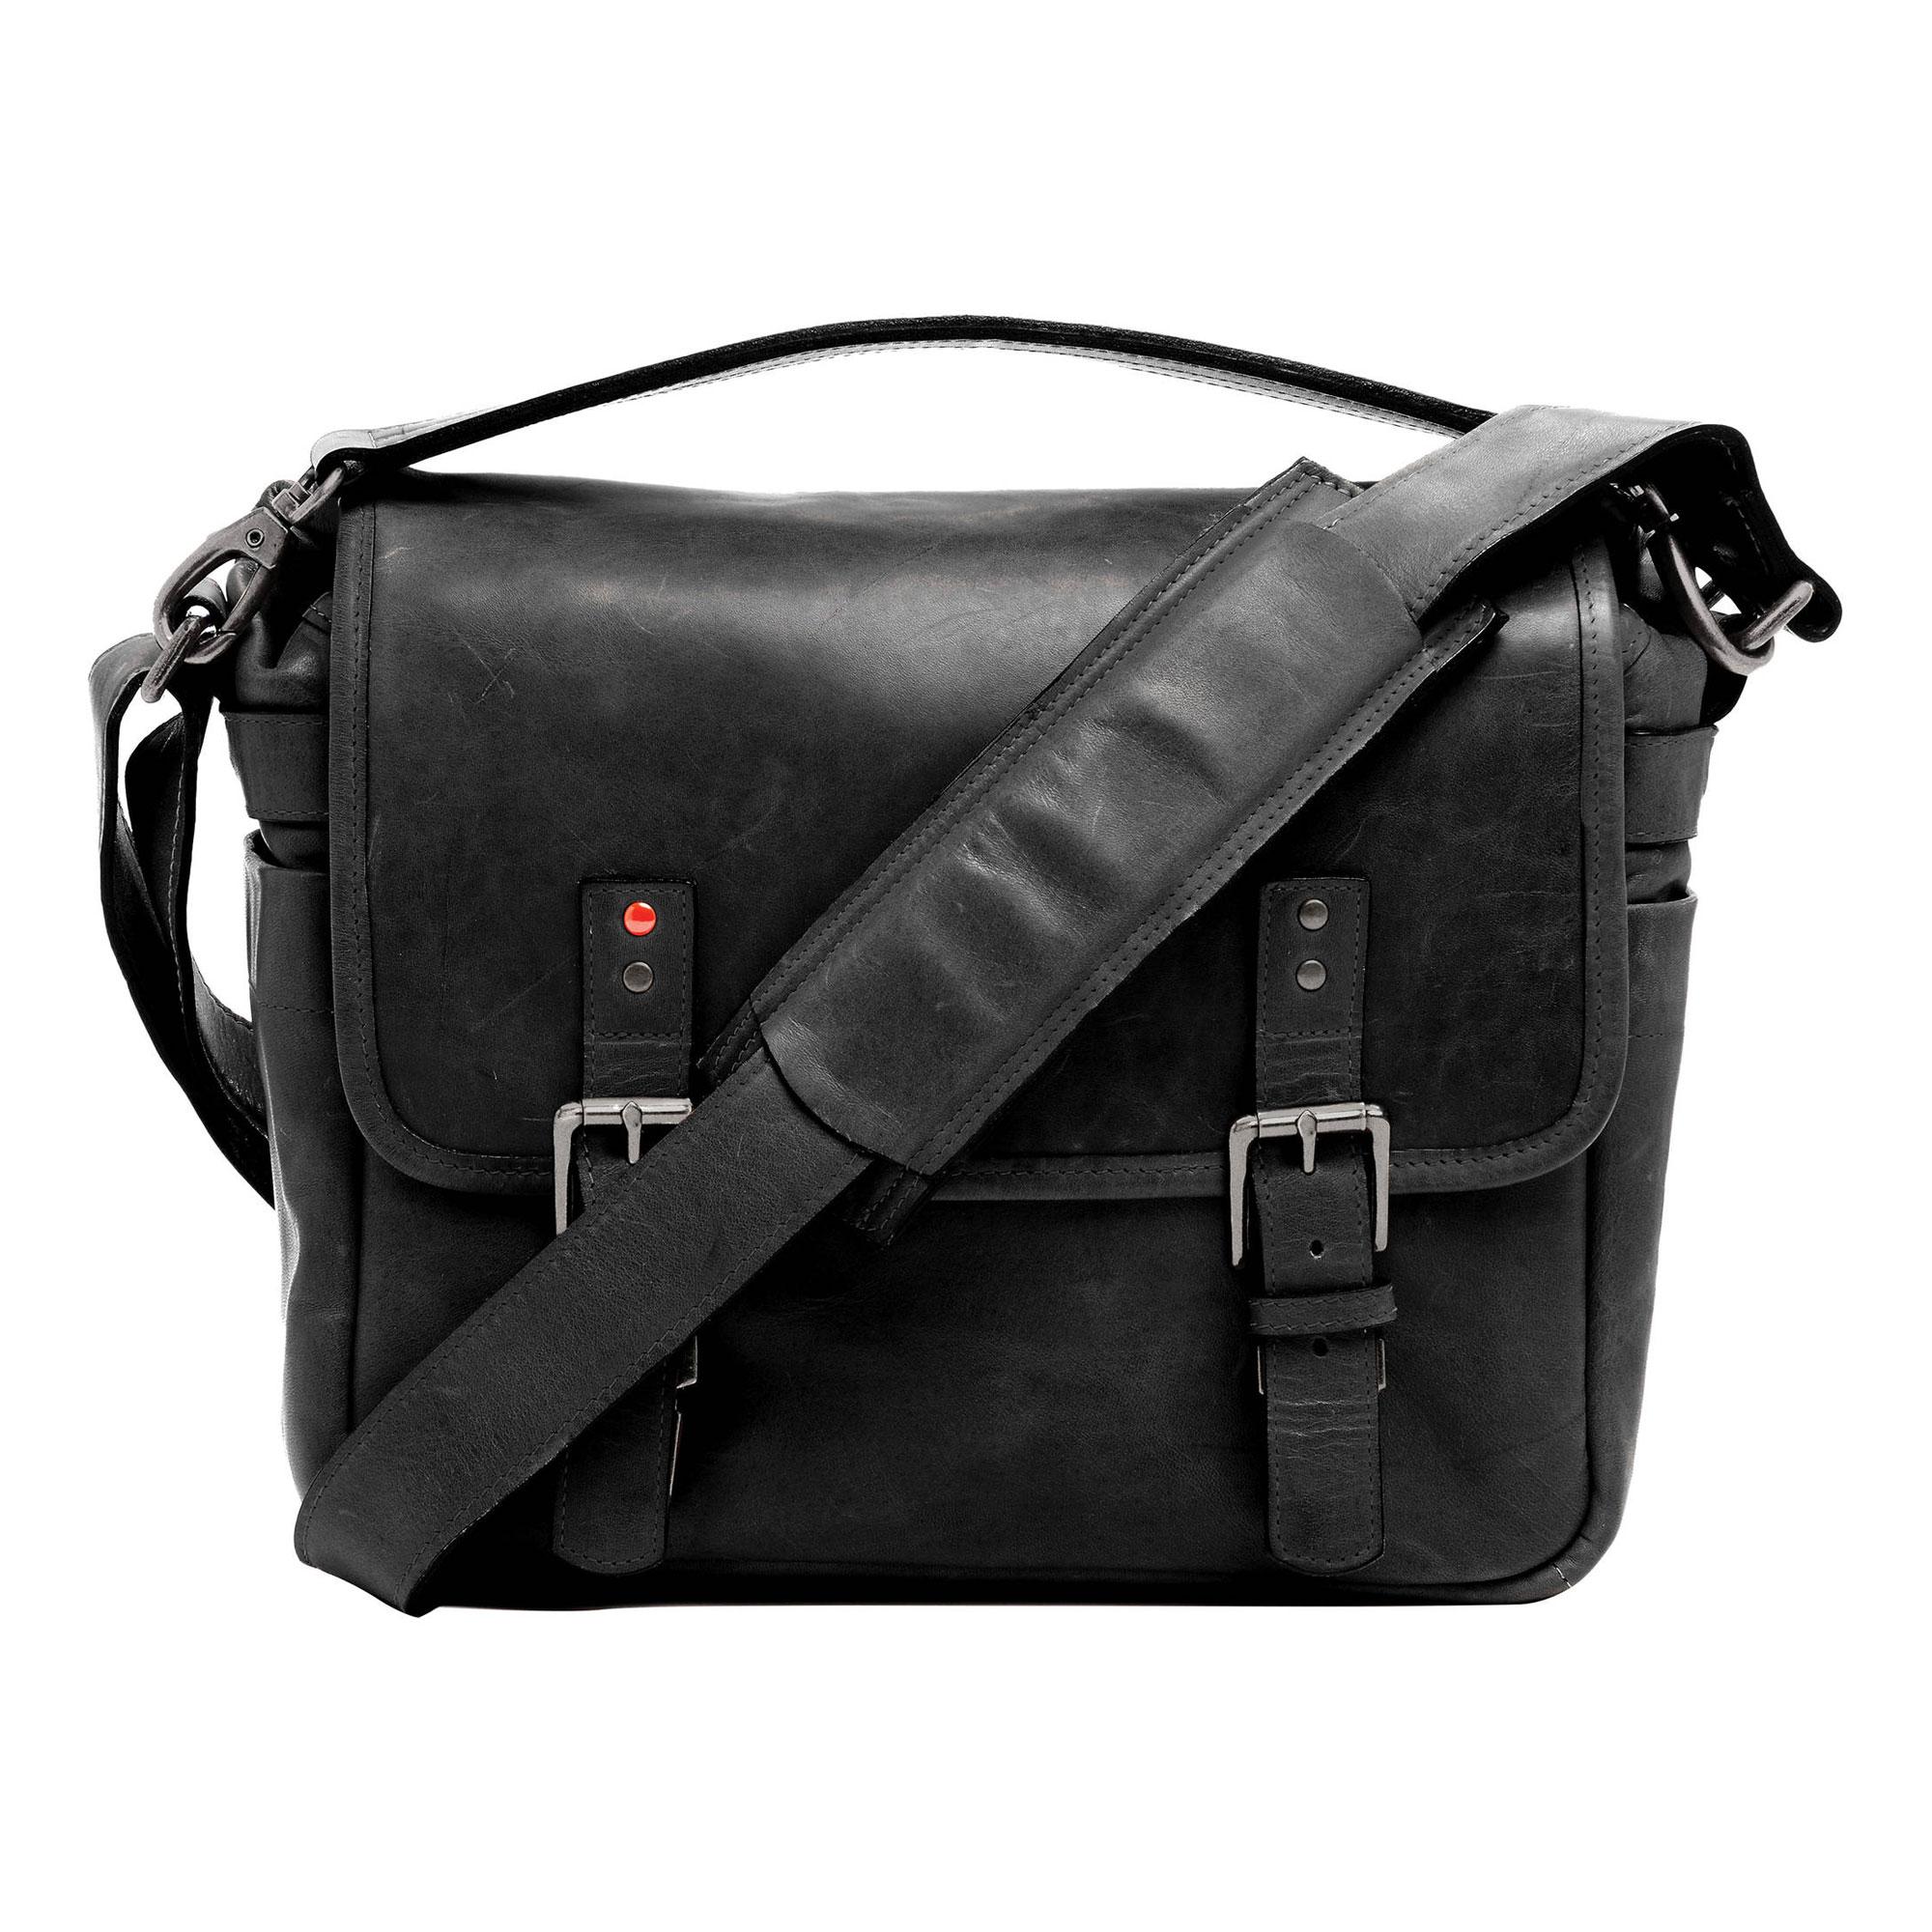 Image of Ona Bags Berlin II Camera Messenger Bag (Black)